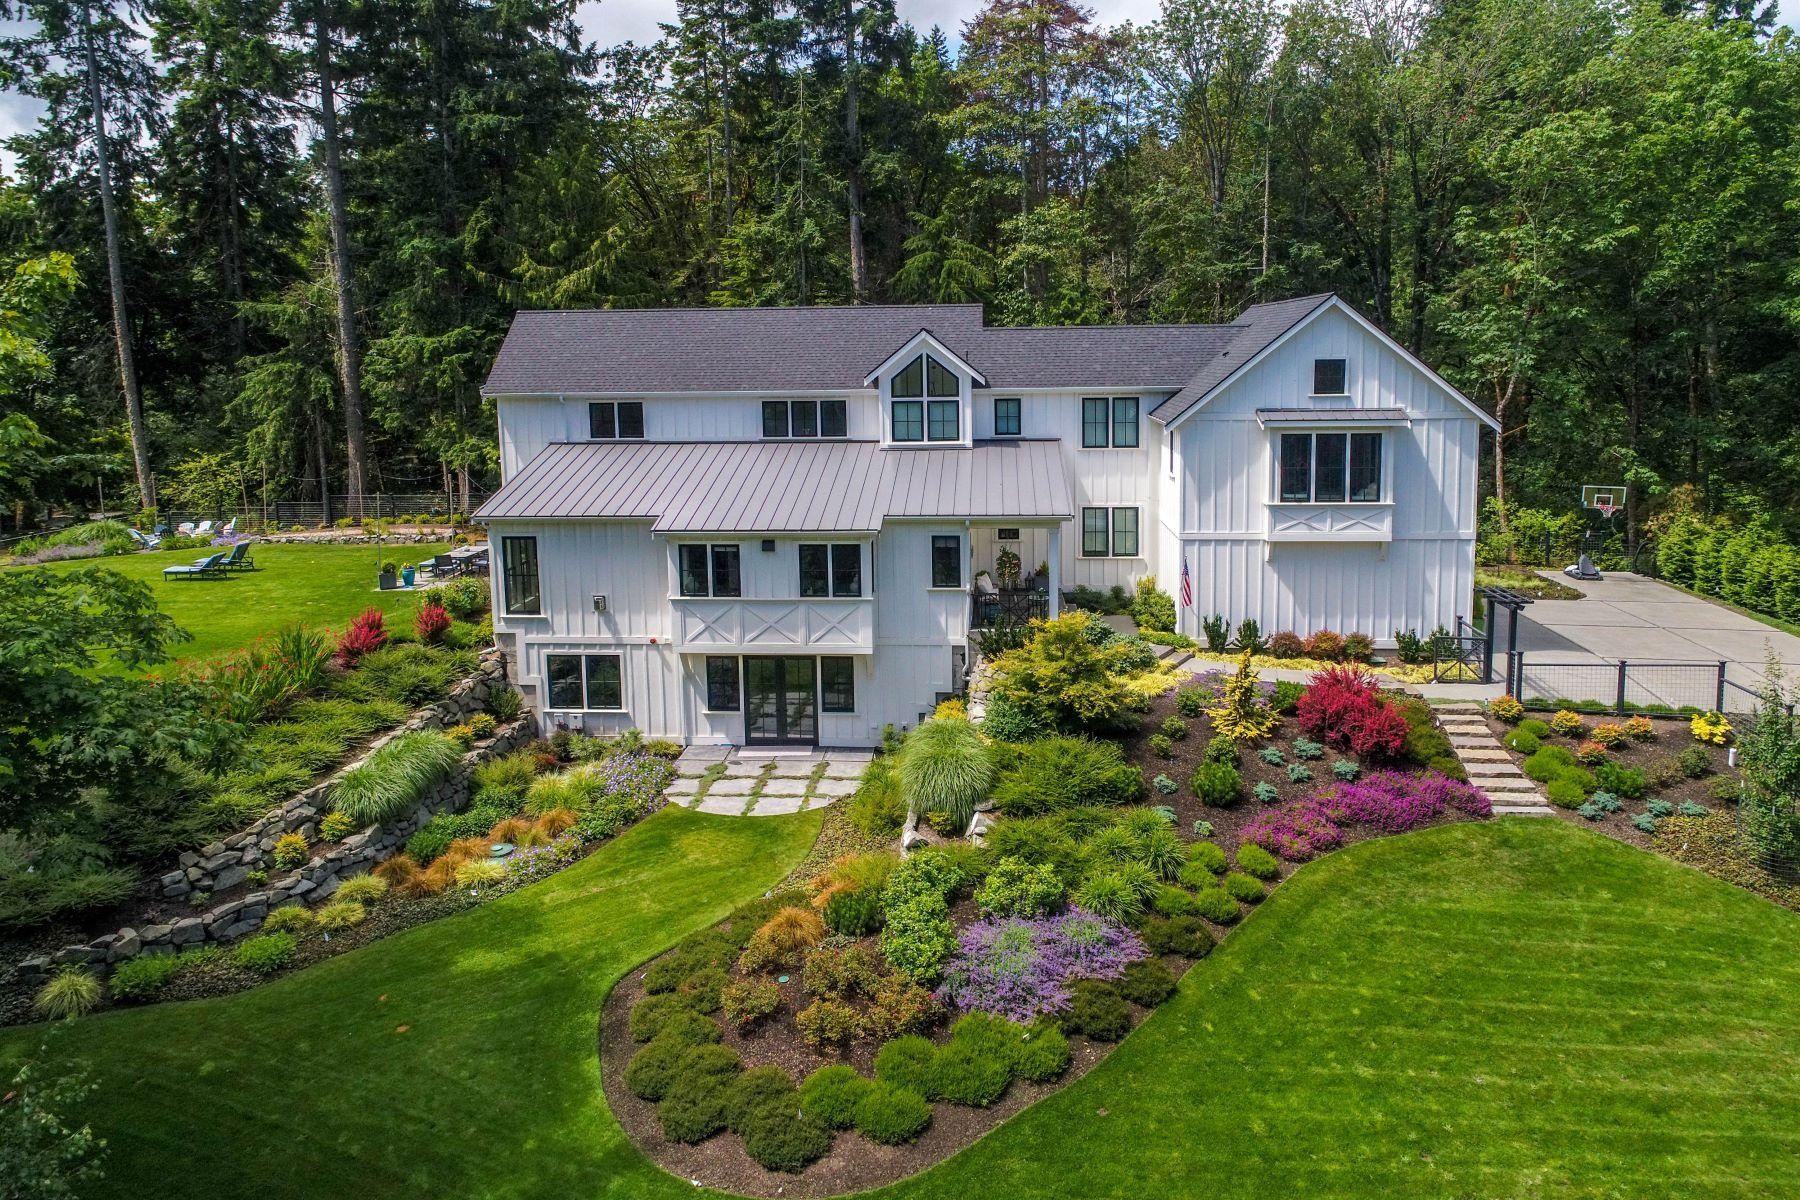 Single Family Homes for Sale at 1511 Summerfield Lane NE, Bainbridge Island, WA 98110 1511 Summerfield Lane NE Bainbridge Island, Washington 98110 United States